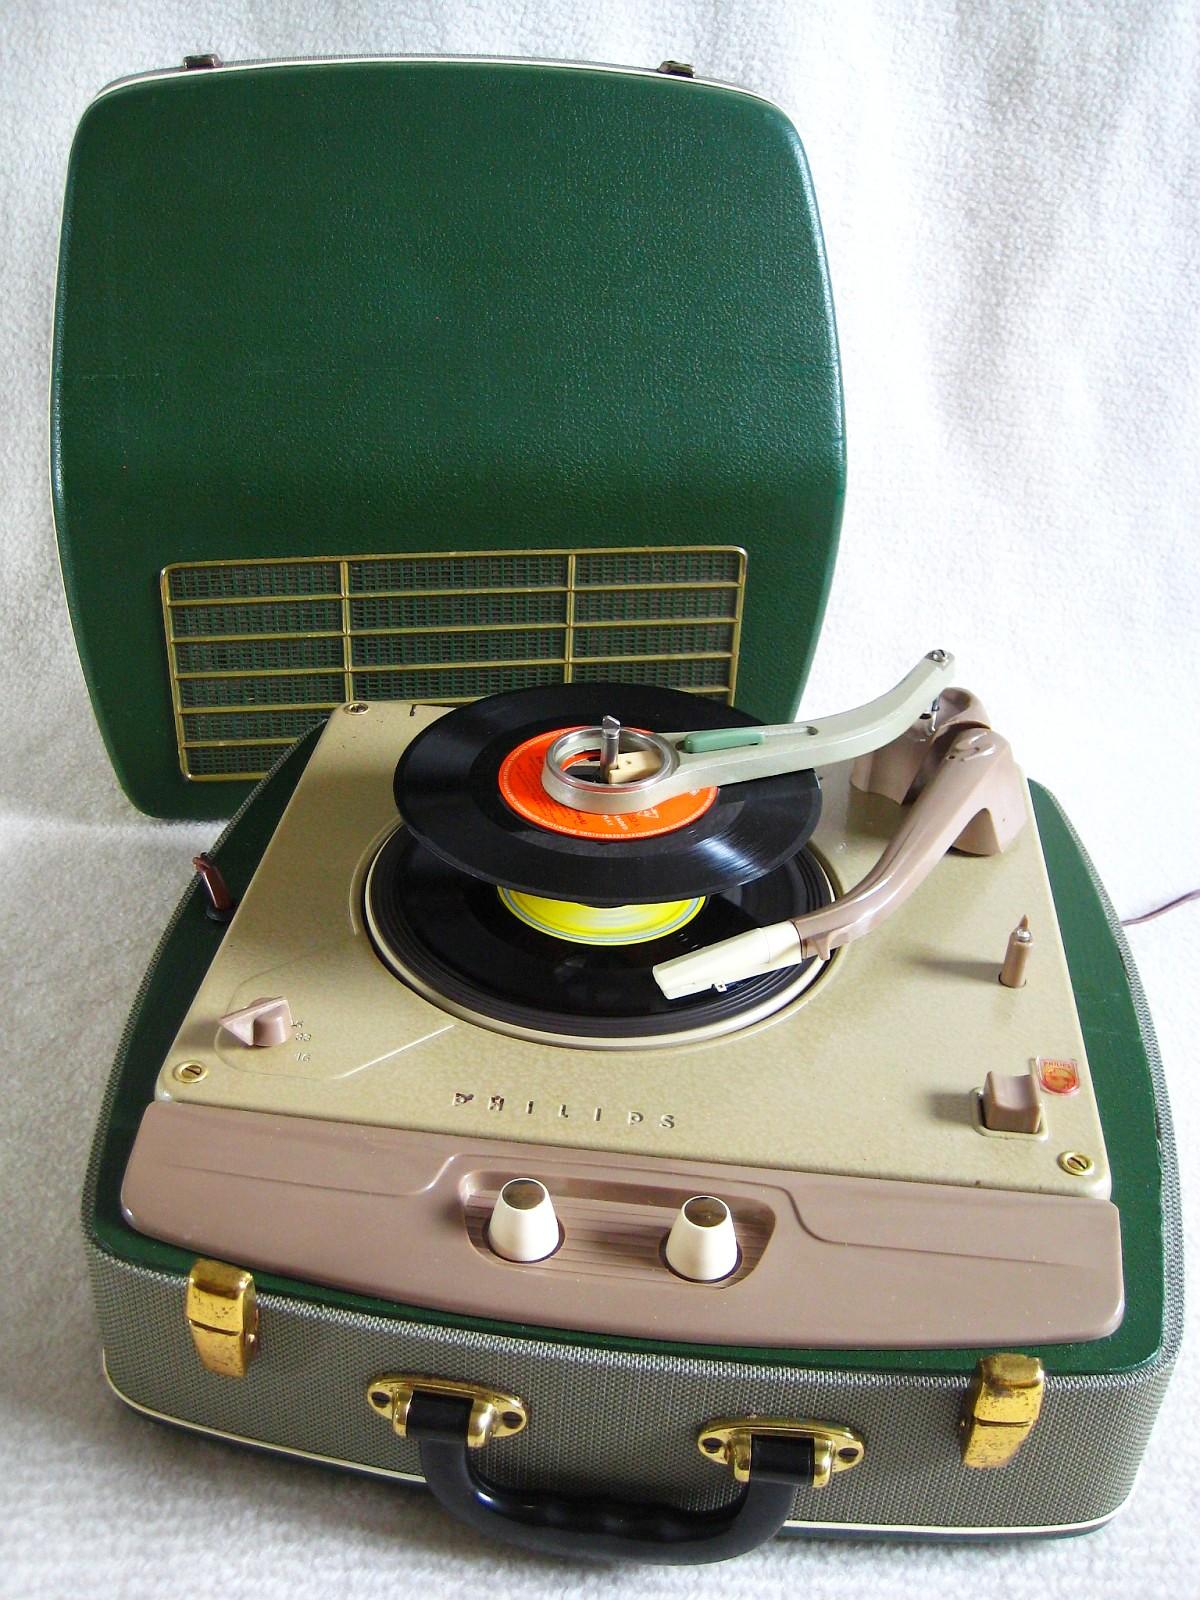 philips ag 9137 vintage hifi turntable koffer. Black Bedroom Furniture Sets. Home Design Ideas